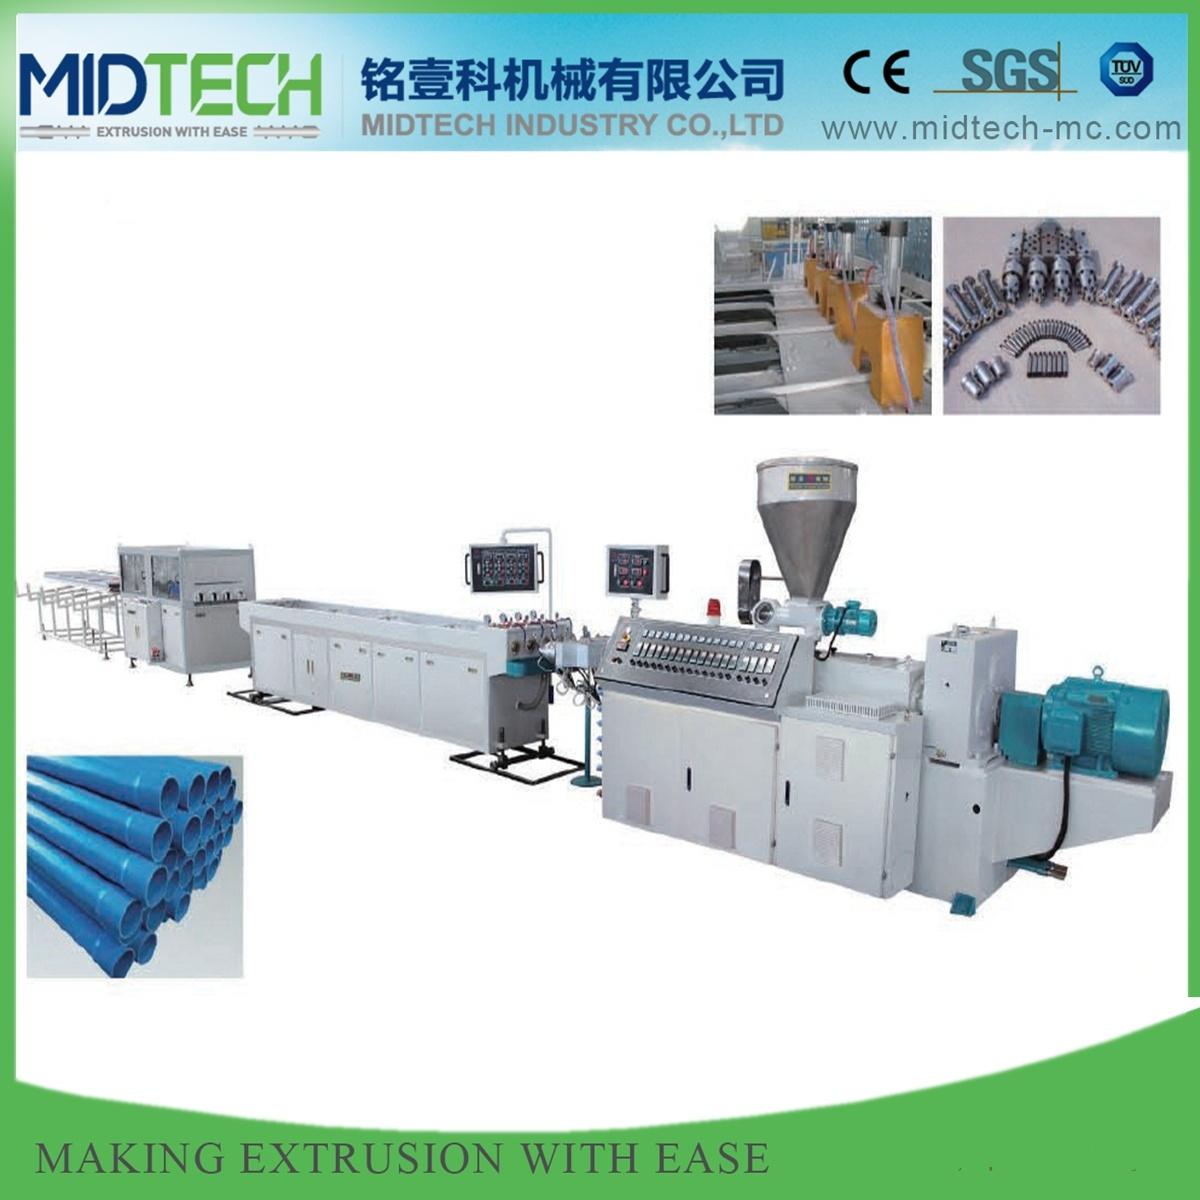 16-32mm Four Cavity PVC UPVC Conduit Electric Pipe Making Extrusion Machine Line